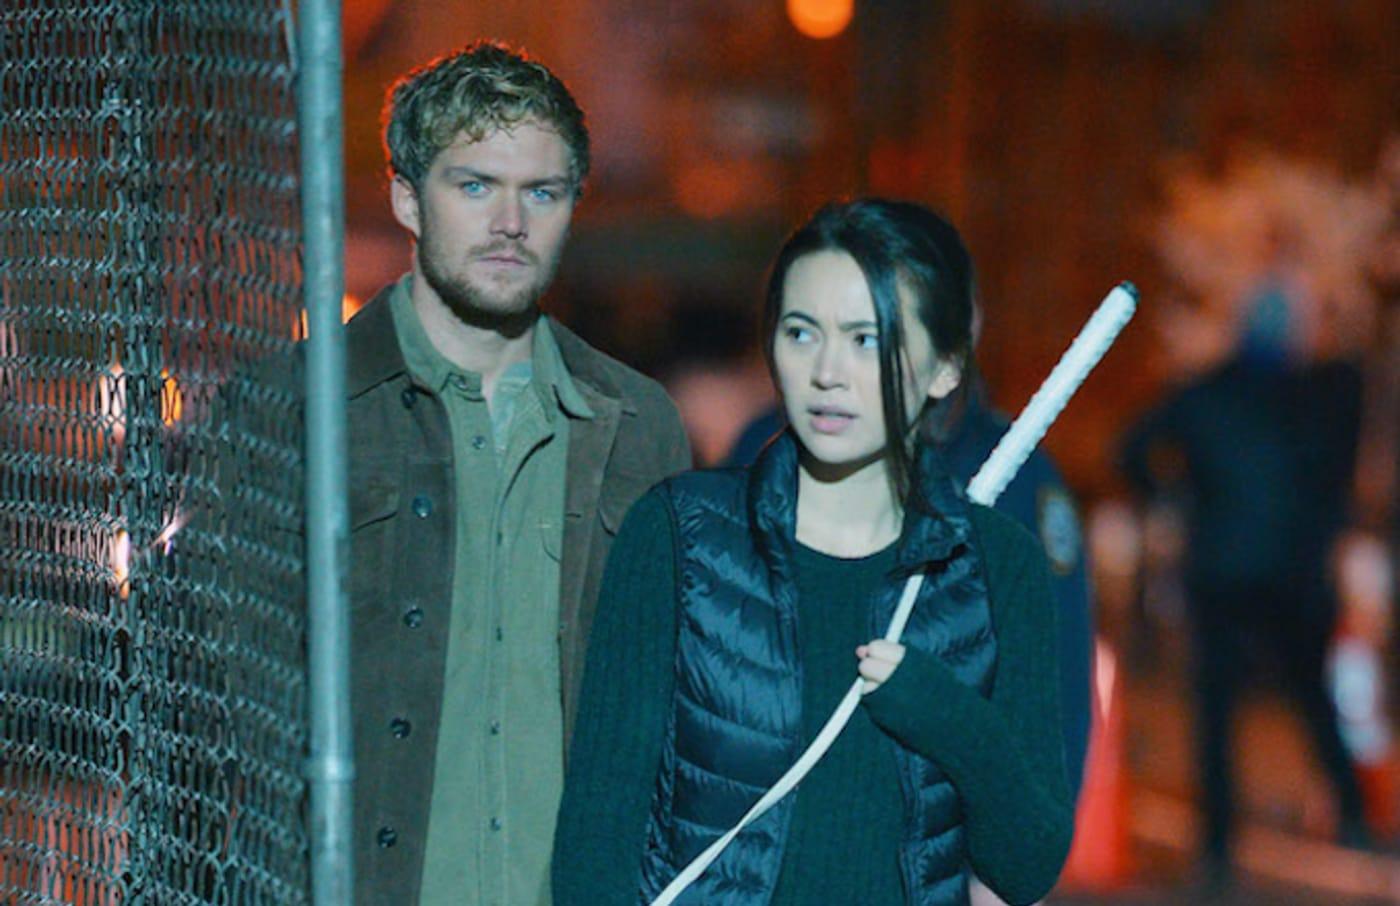 Jessica Henwick and Finn Jones on the set of 'Iron Fist'